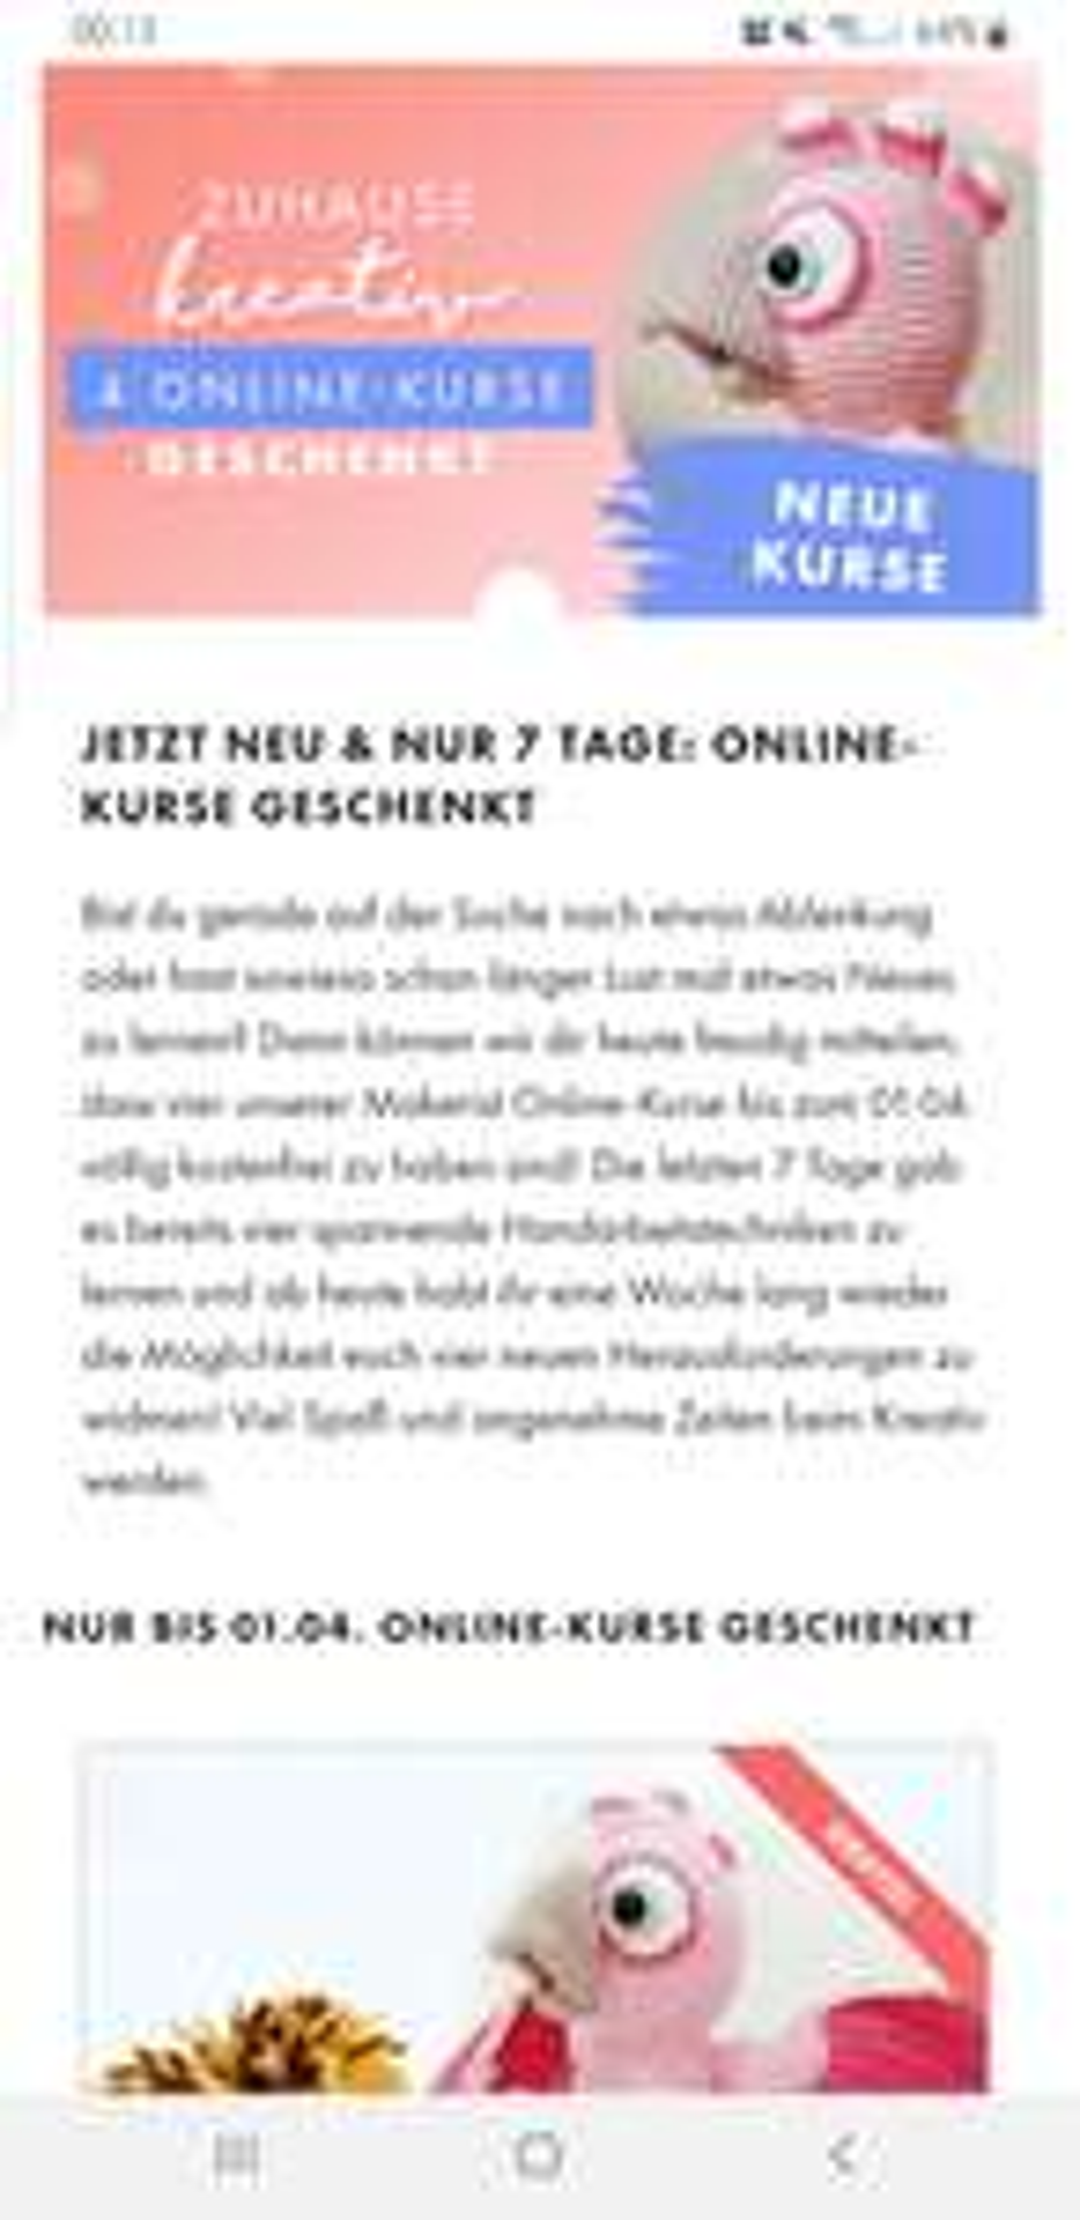 Online Handarbeitskurse